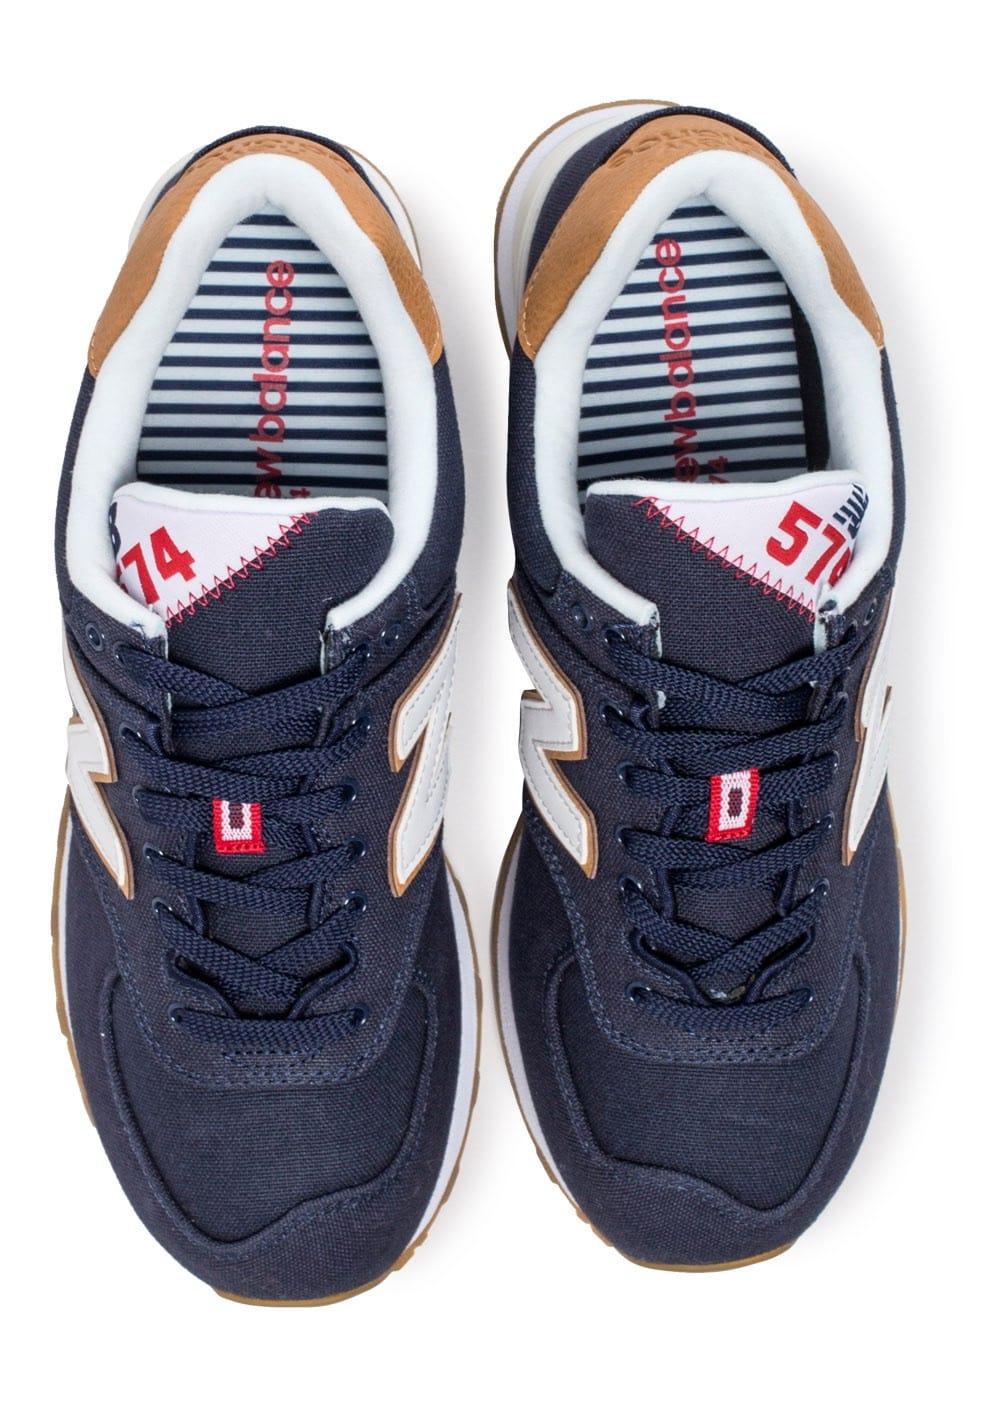 great fit c31ac 95e22 6 sur 9 New Balance 574 Canvas Scarpe Sneakers Ginnastica Tennis Lifestyle  Blu